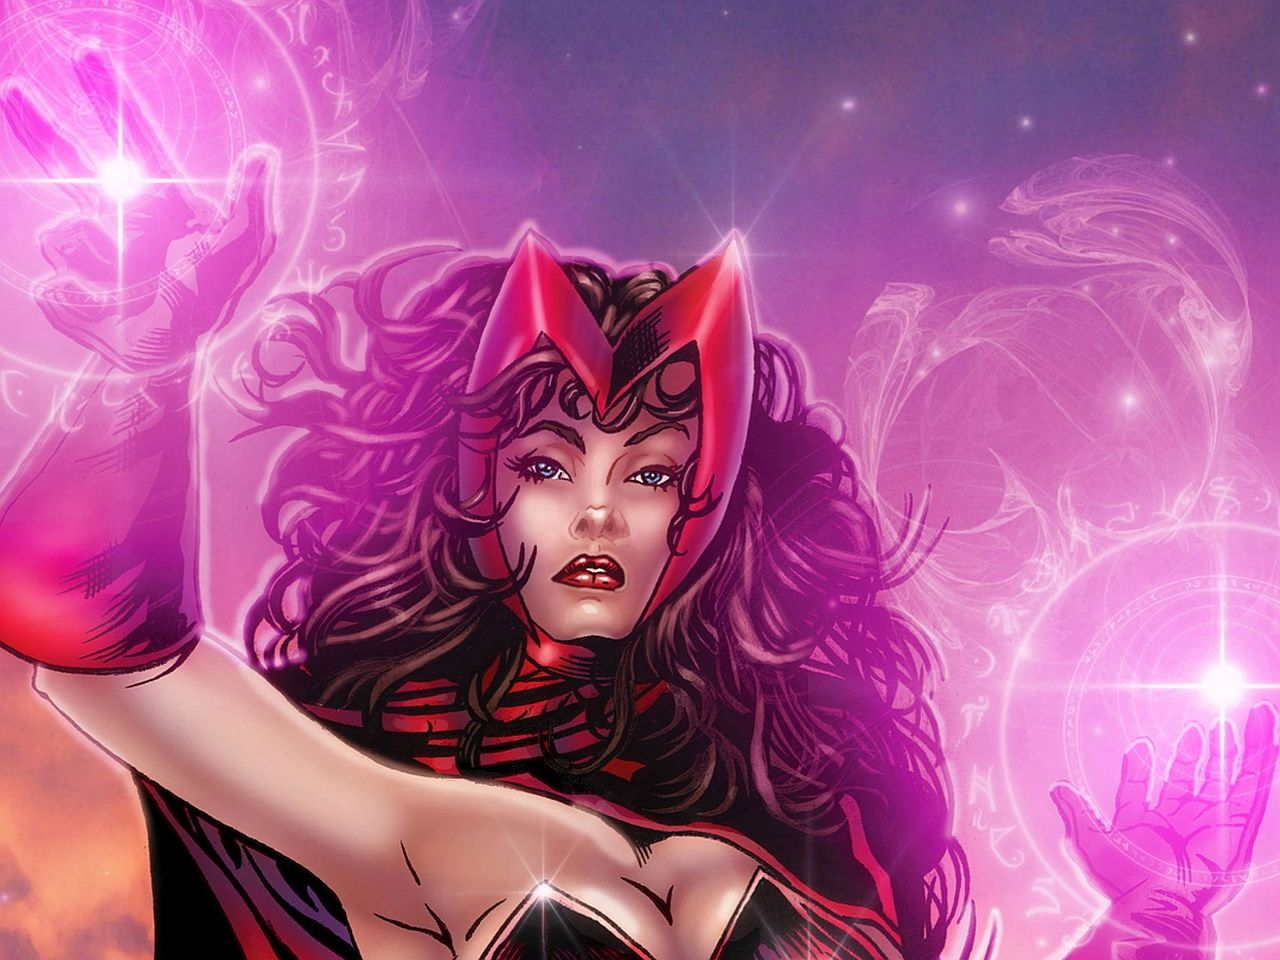 Great Wallpaper Marvel Scarlet Witch - 8578d7197a91de28449b3a6eb41380c6  Snapshot_134020.jpg